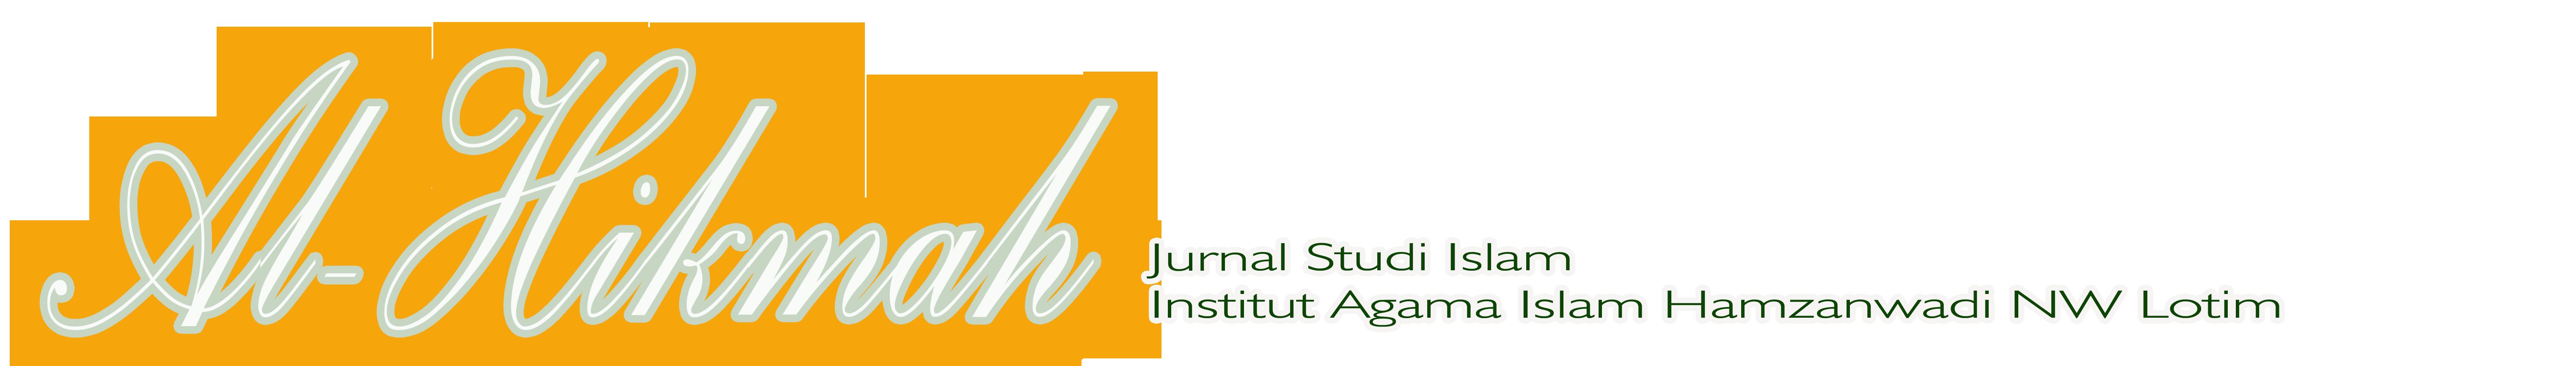 Jurnal Studi Islam